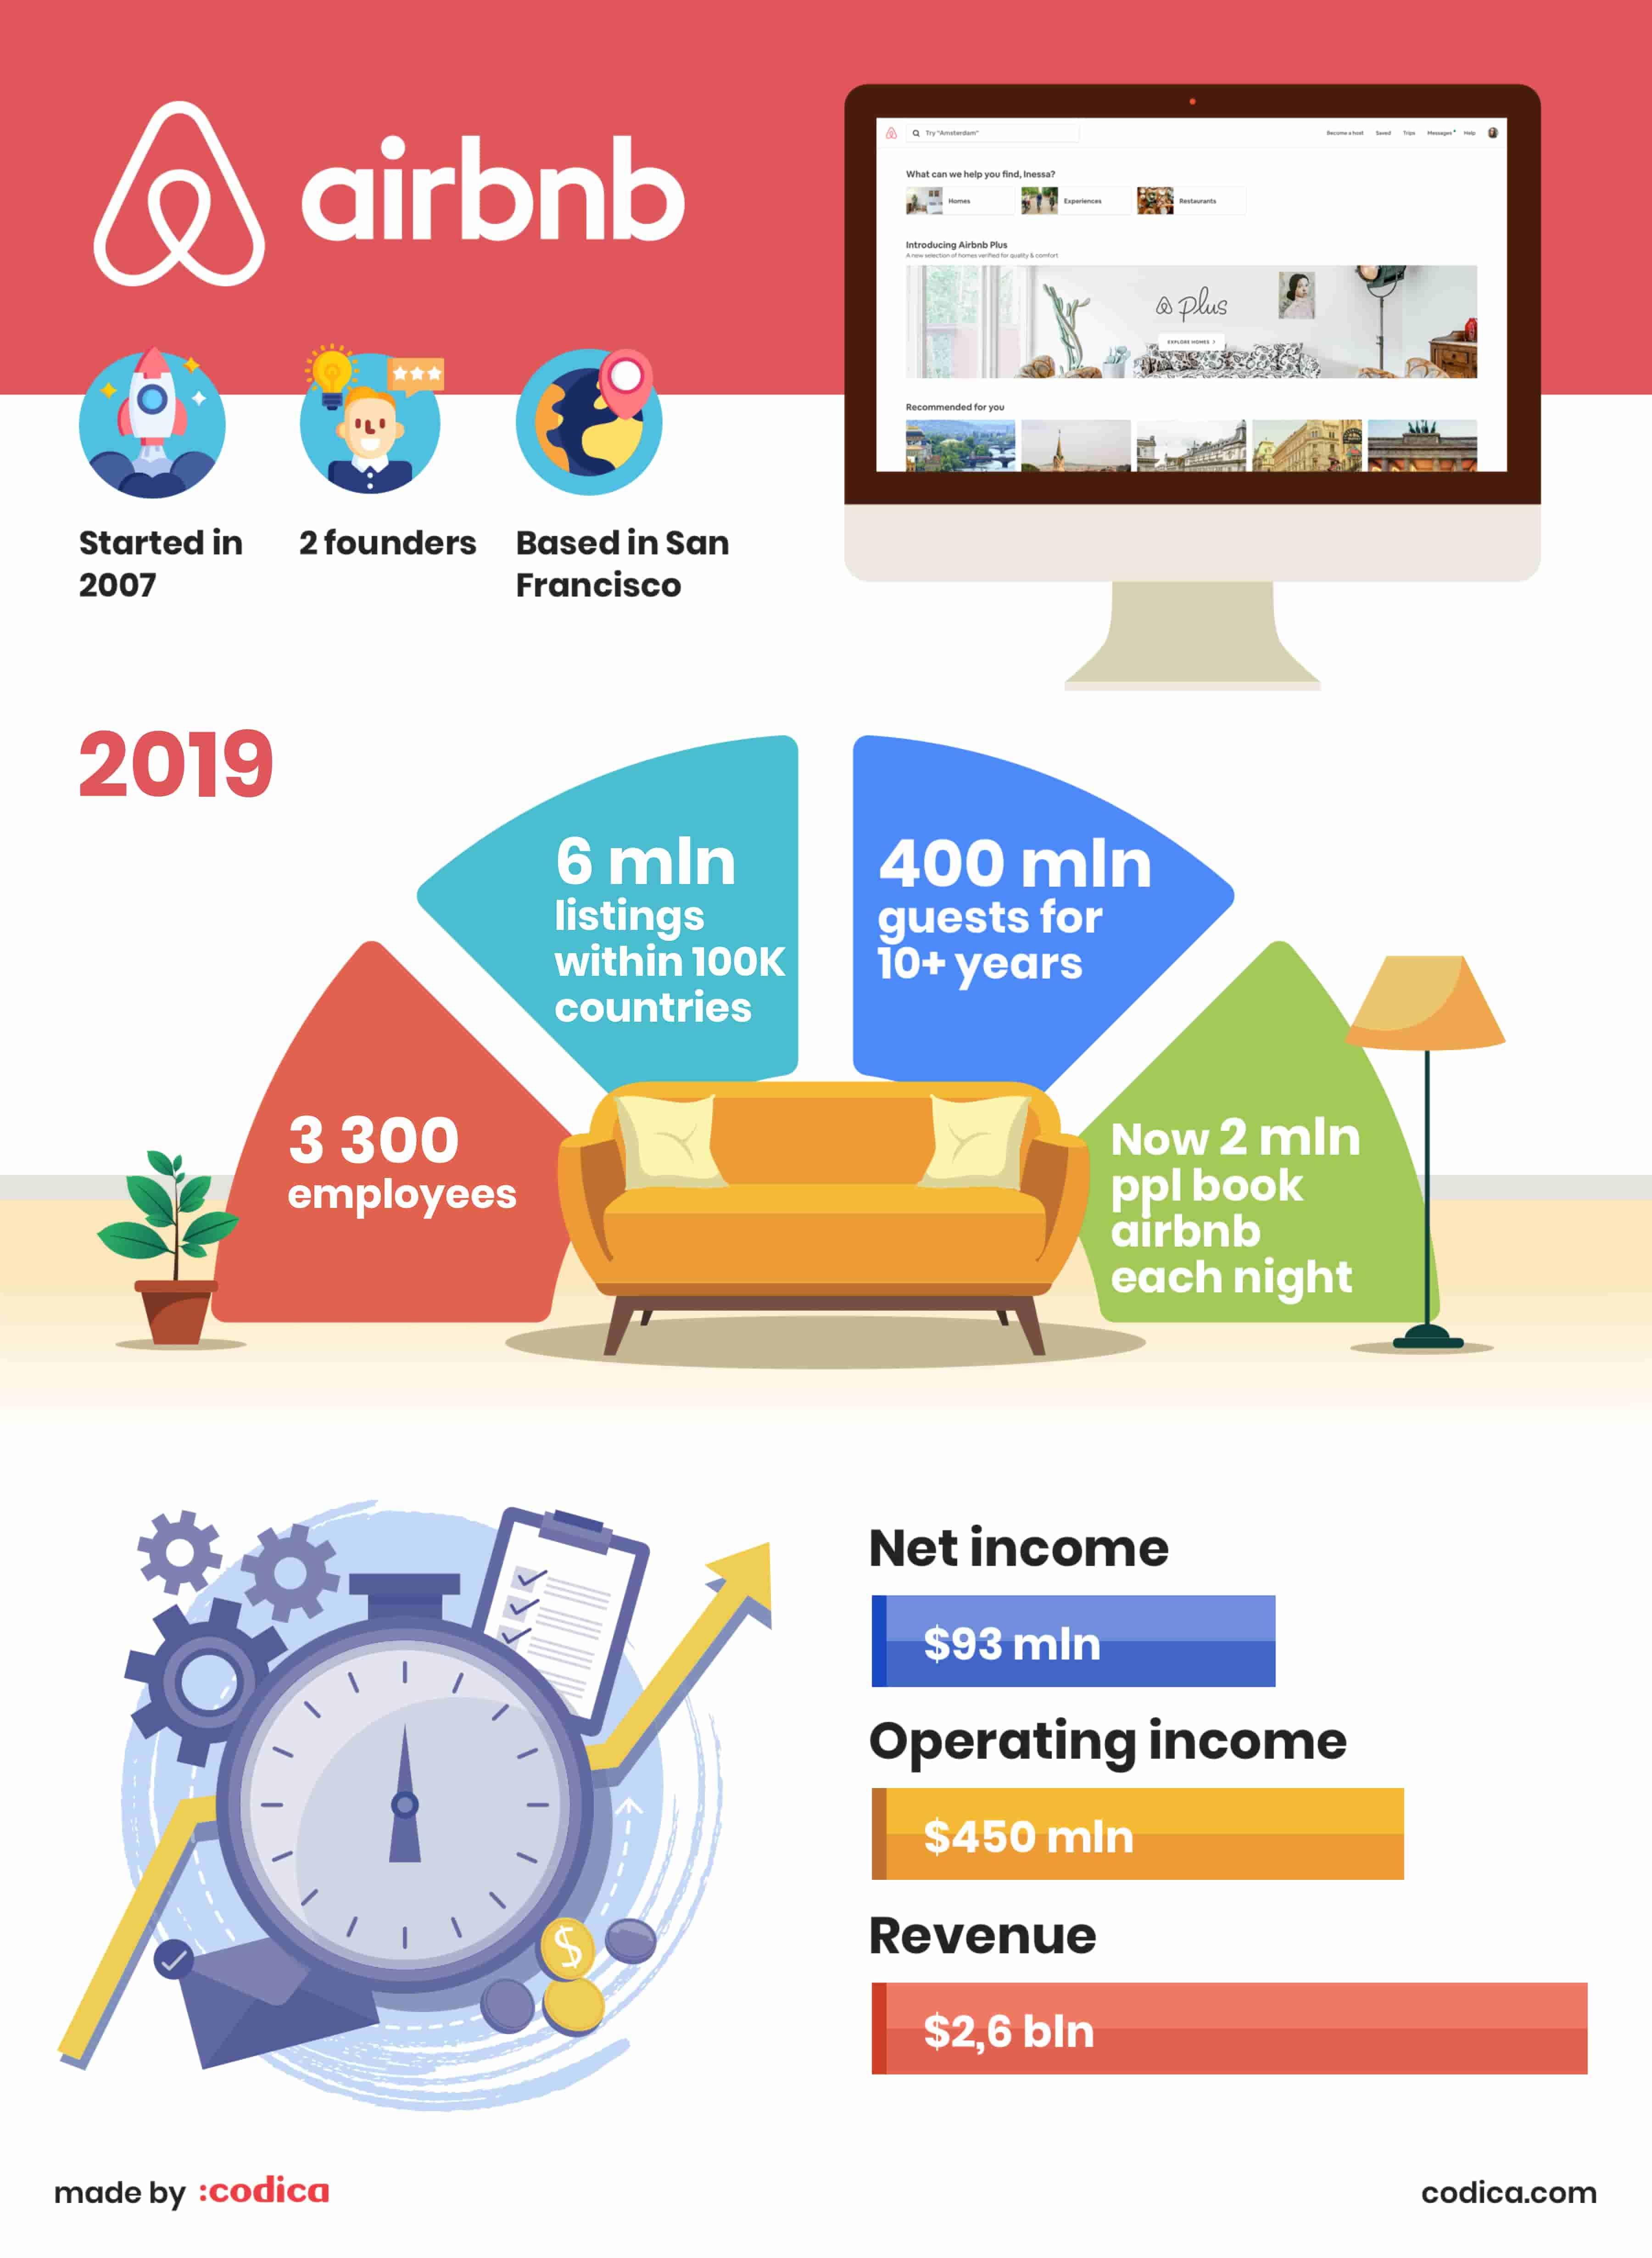 Airbnb stats 2019 | Codica